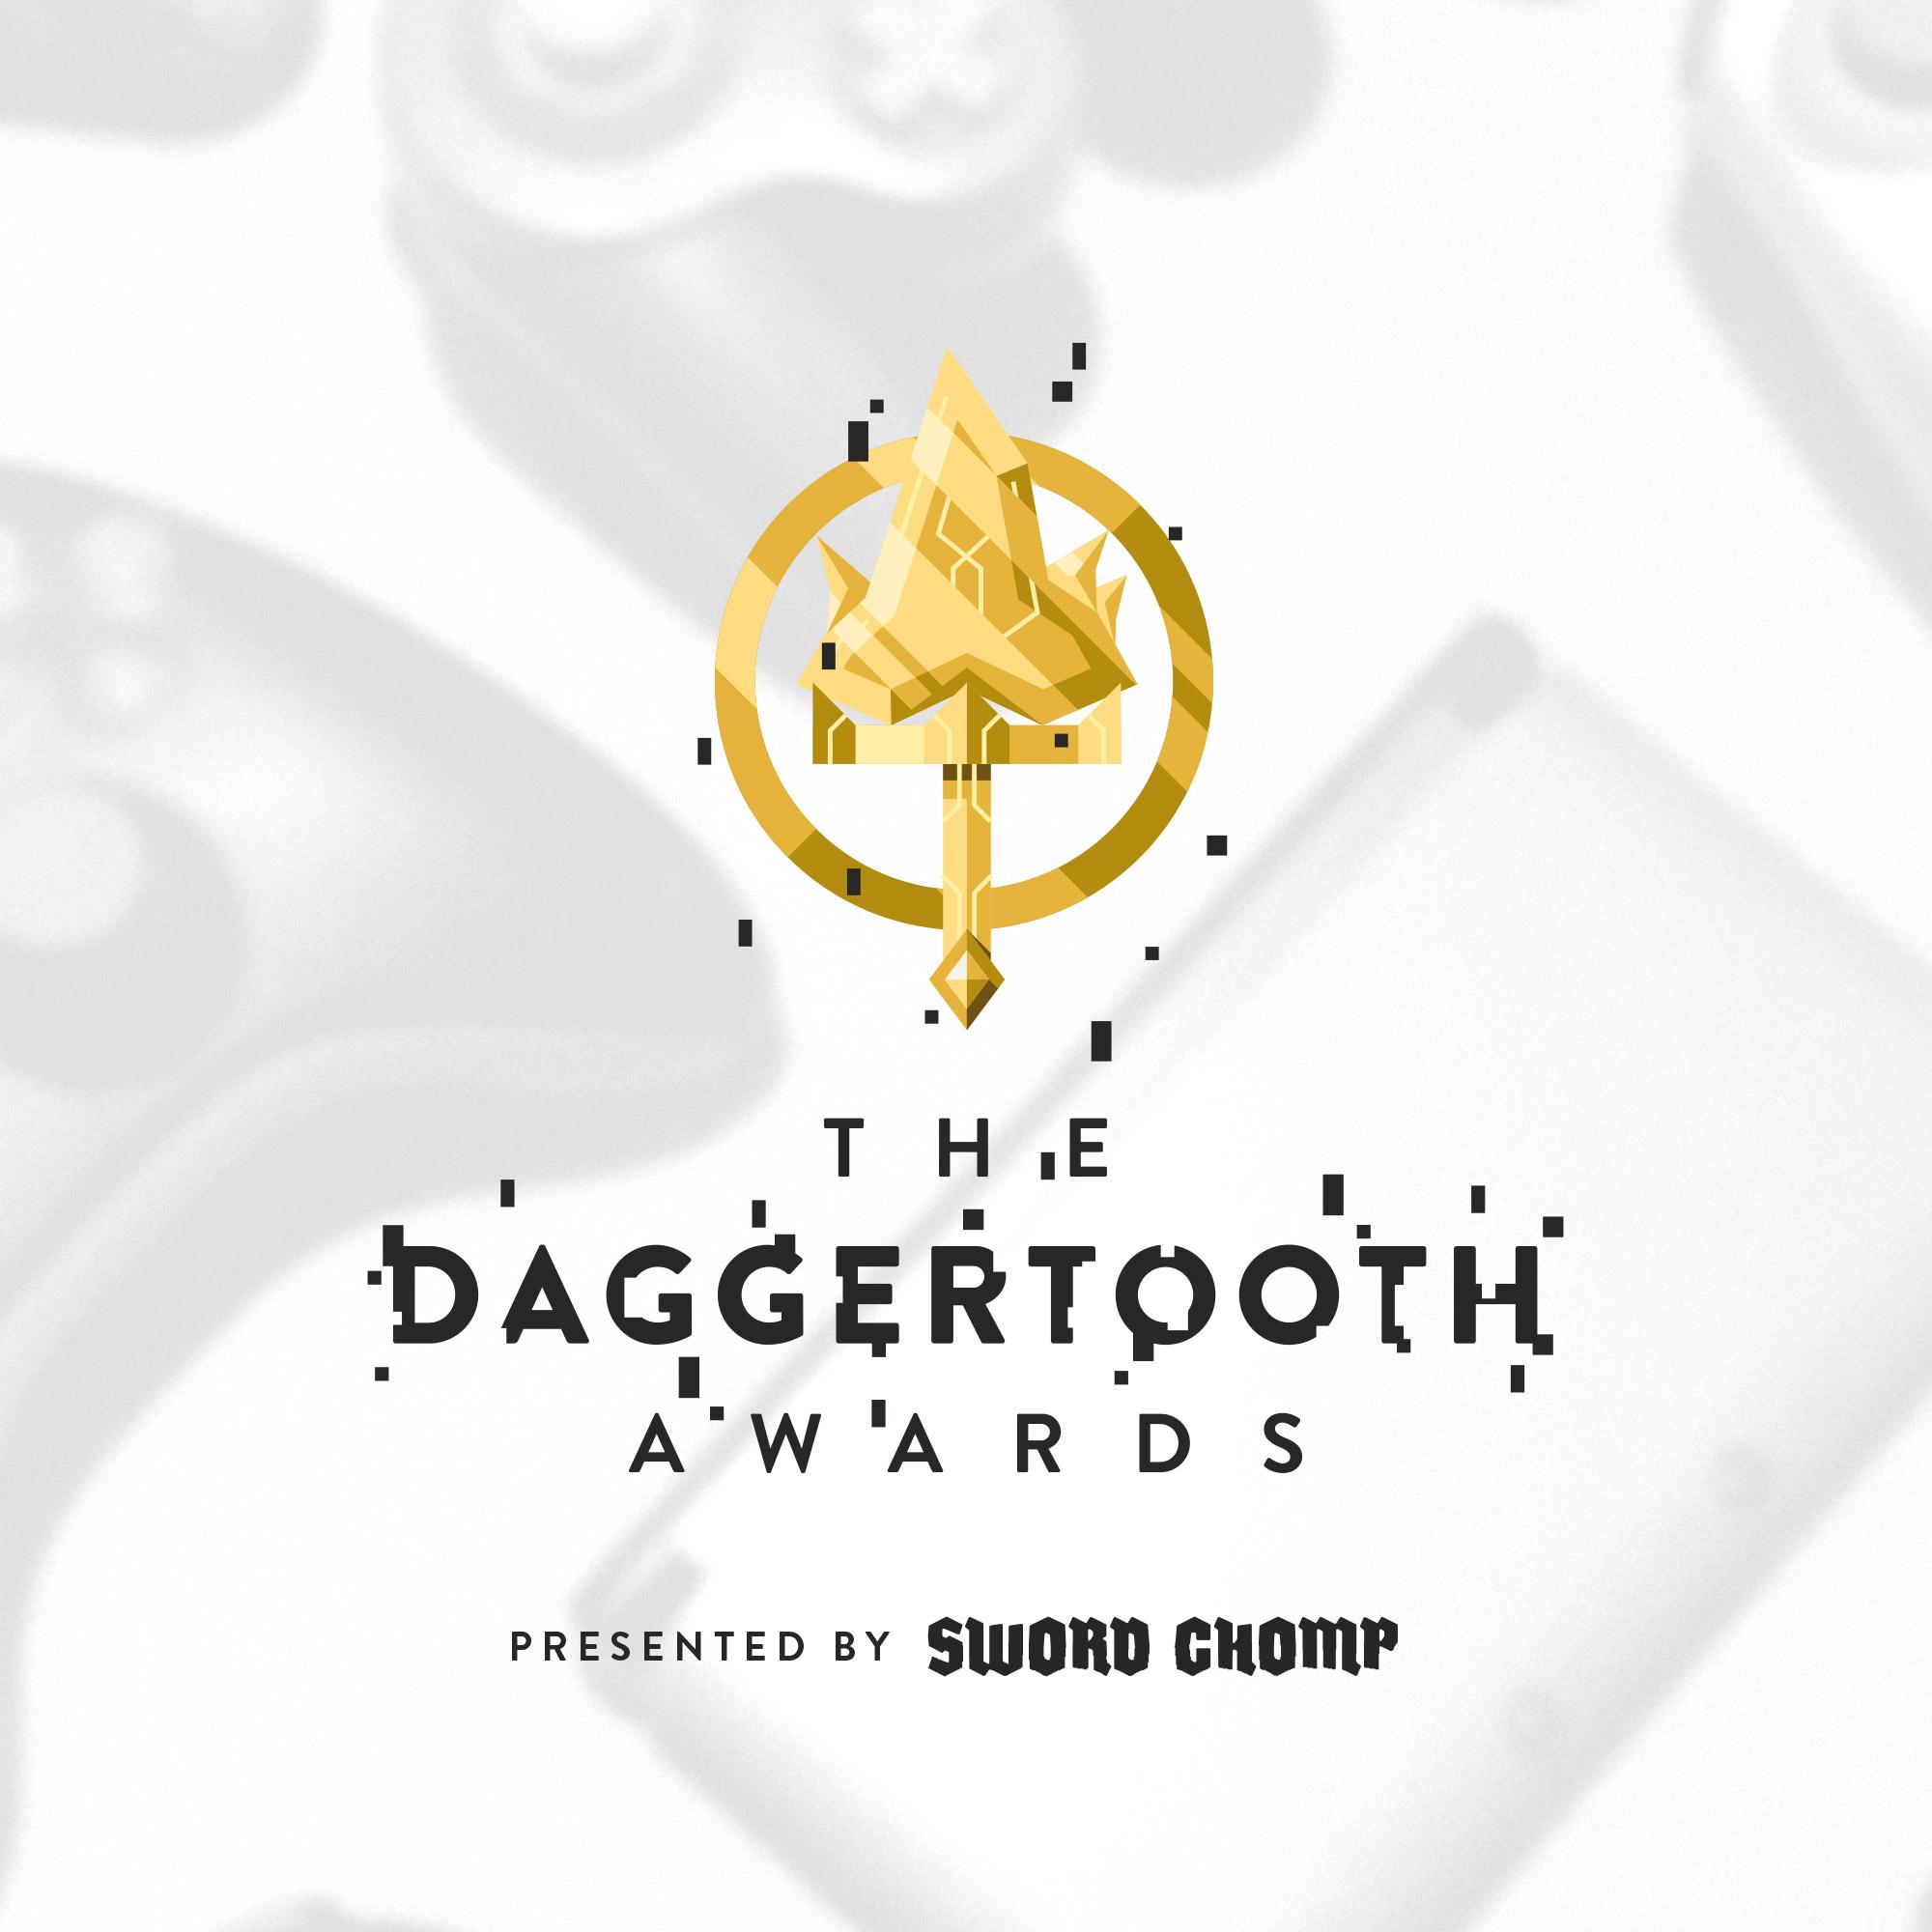 The-Daggertooth-Awards_Square-Artwork_2.jpg